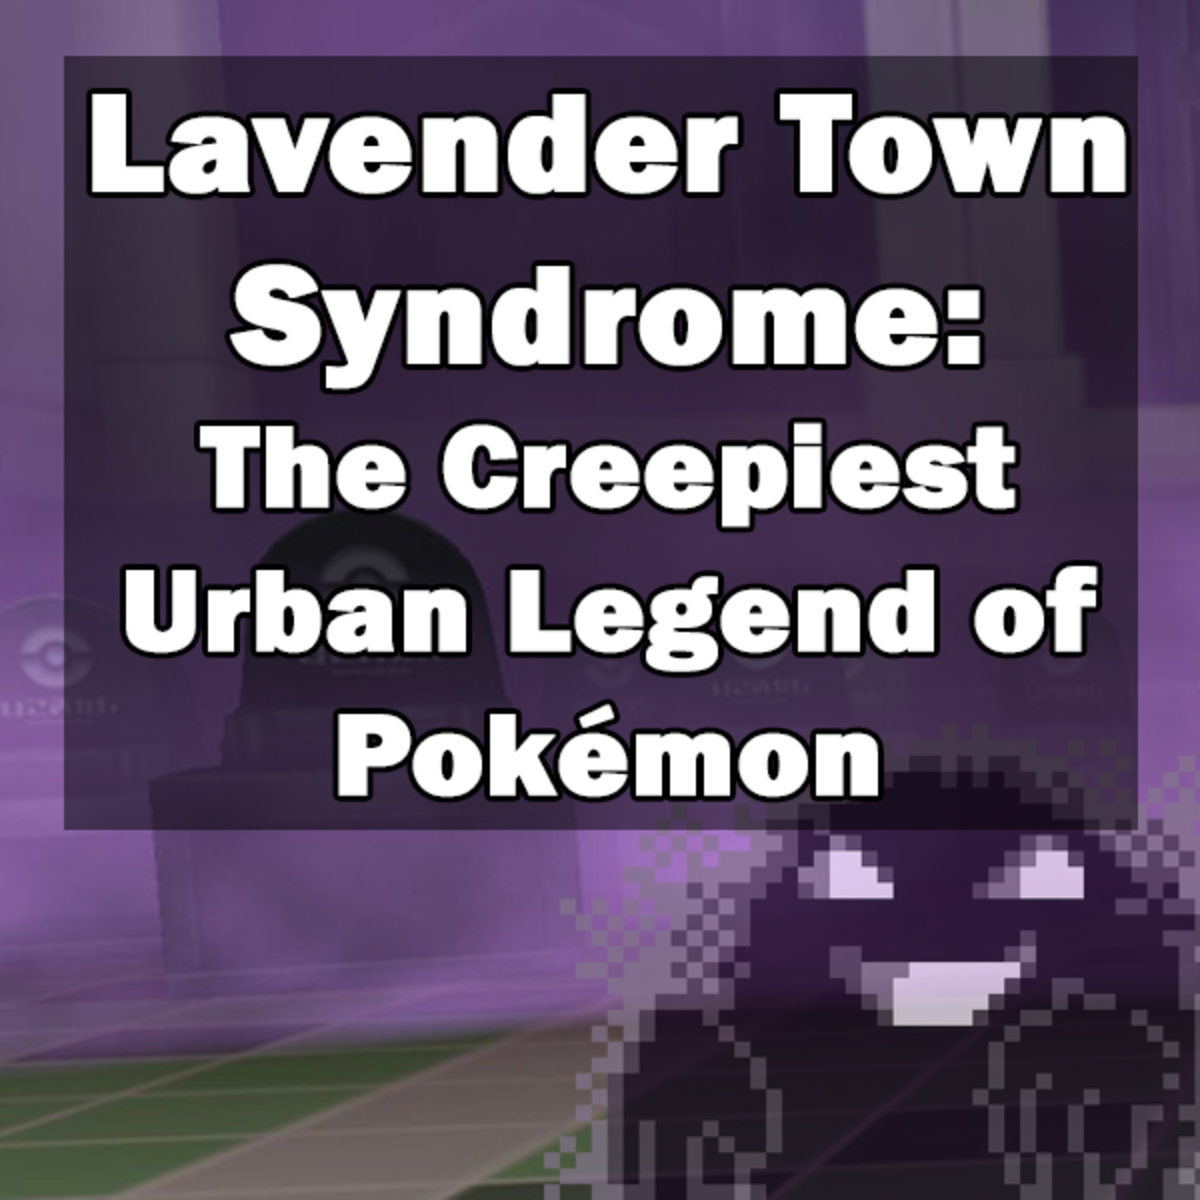 Lavender Town Syndrome: The Creepiest Urban Legend of Pokémon